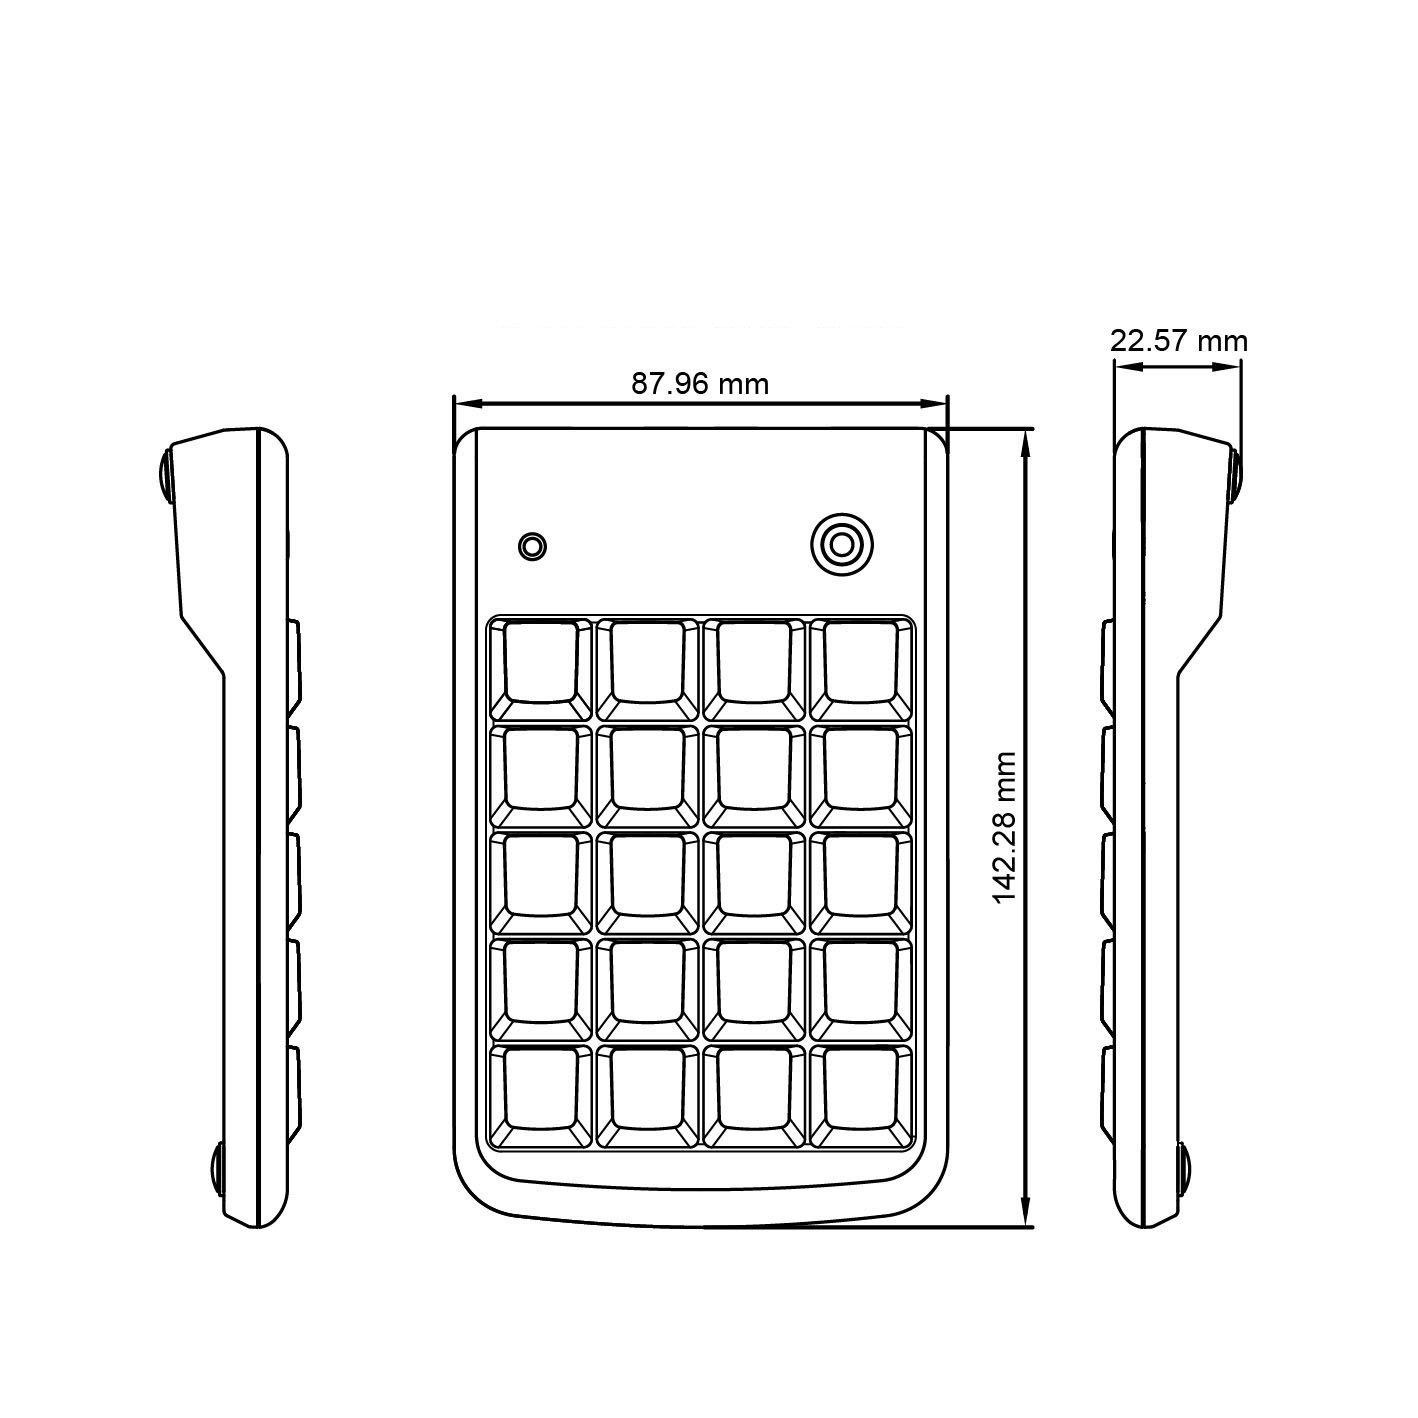 12.25x12.25x4.5 Type 14 Water to Air Intercooler Bend I//O